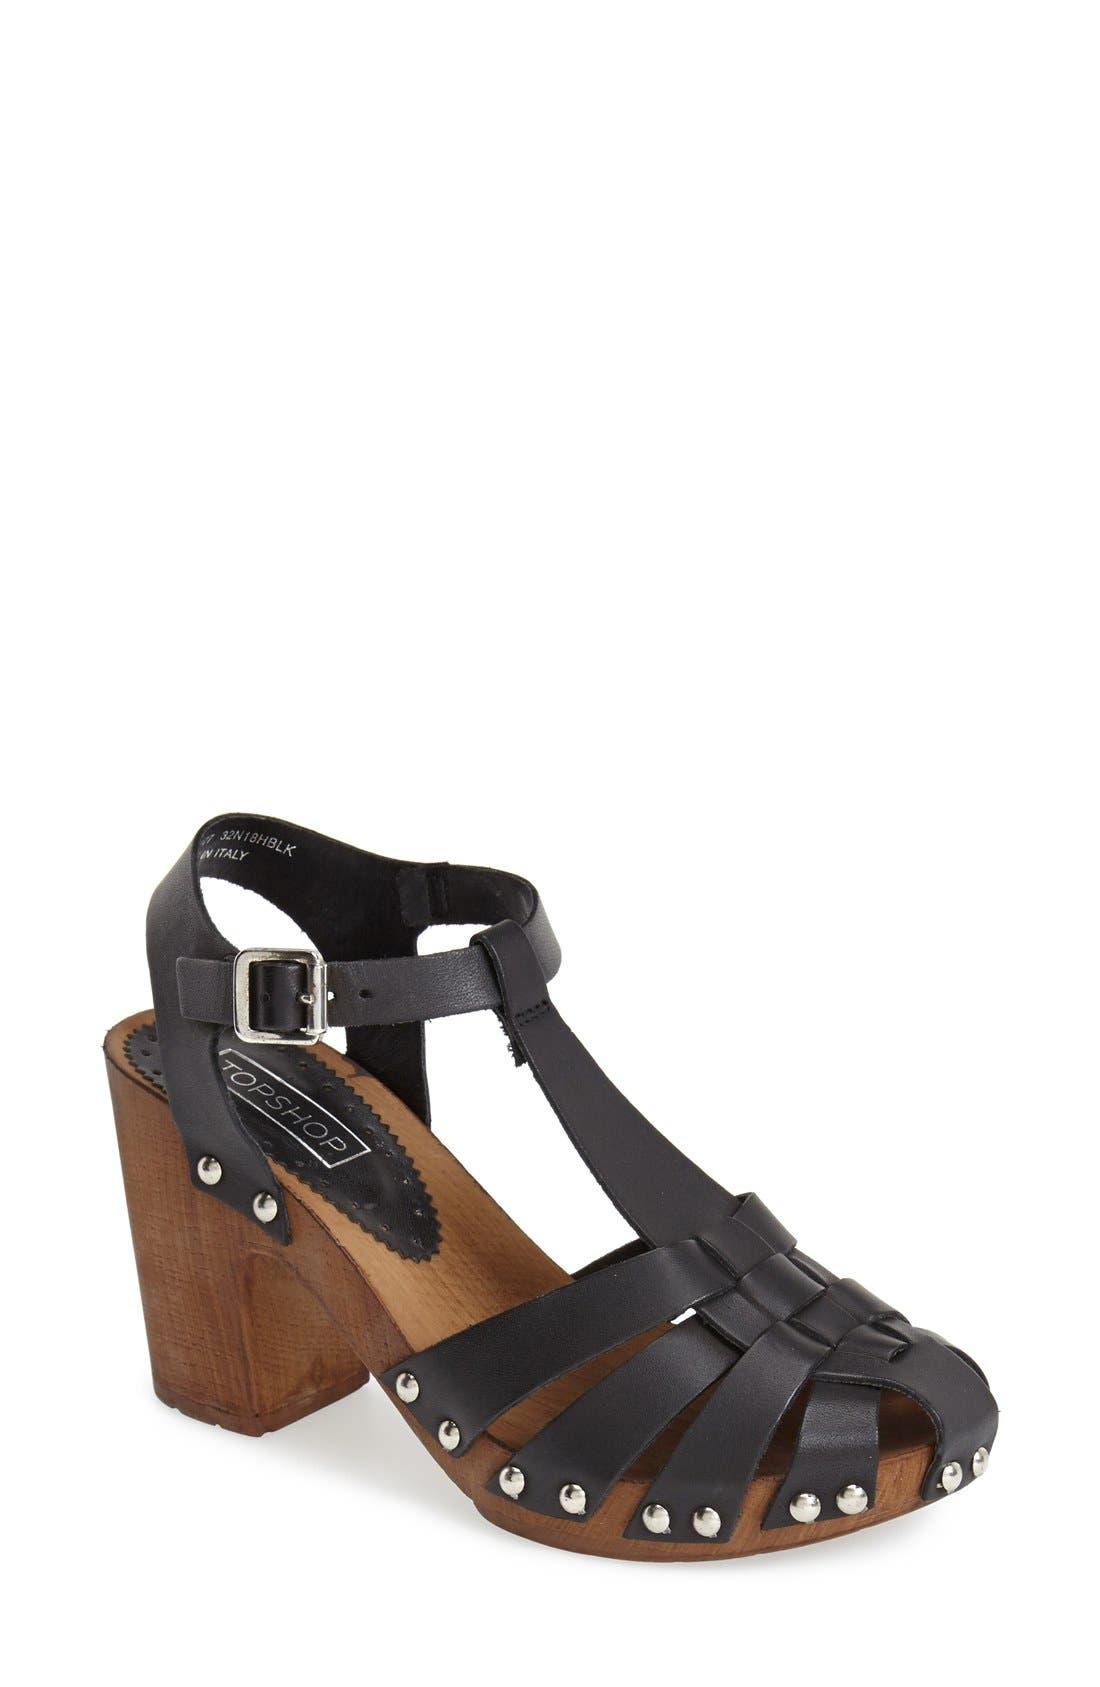 Main Image - Topshop 'Nelly' Leather Platform Sandal (Women)